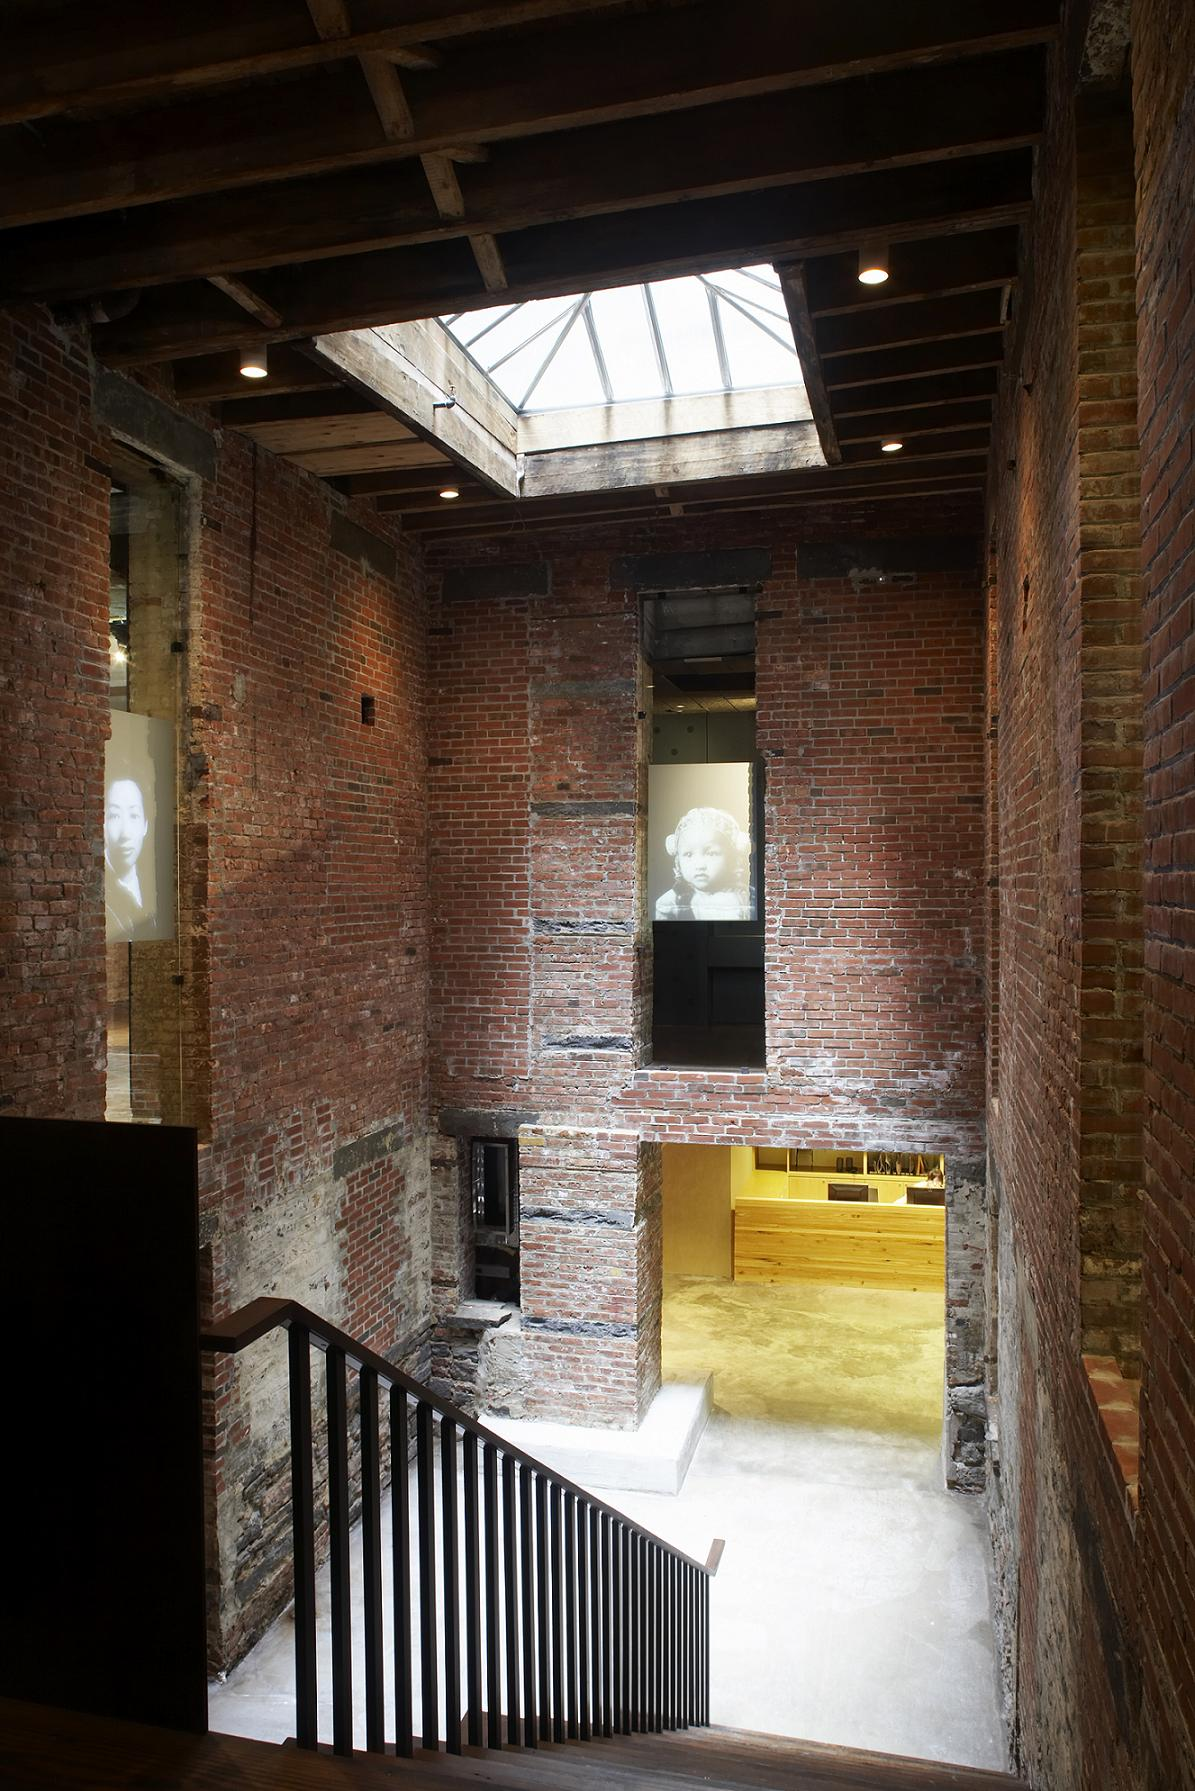 2012-01-12-MOCAcourtyard.jpg